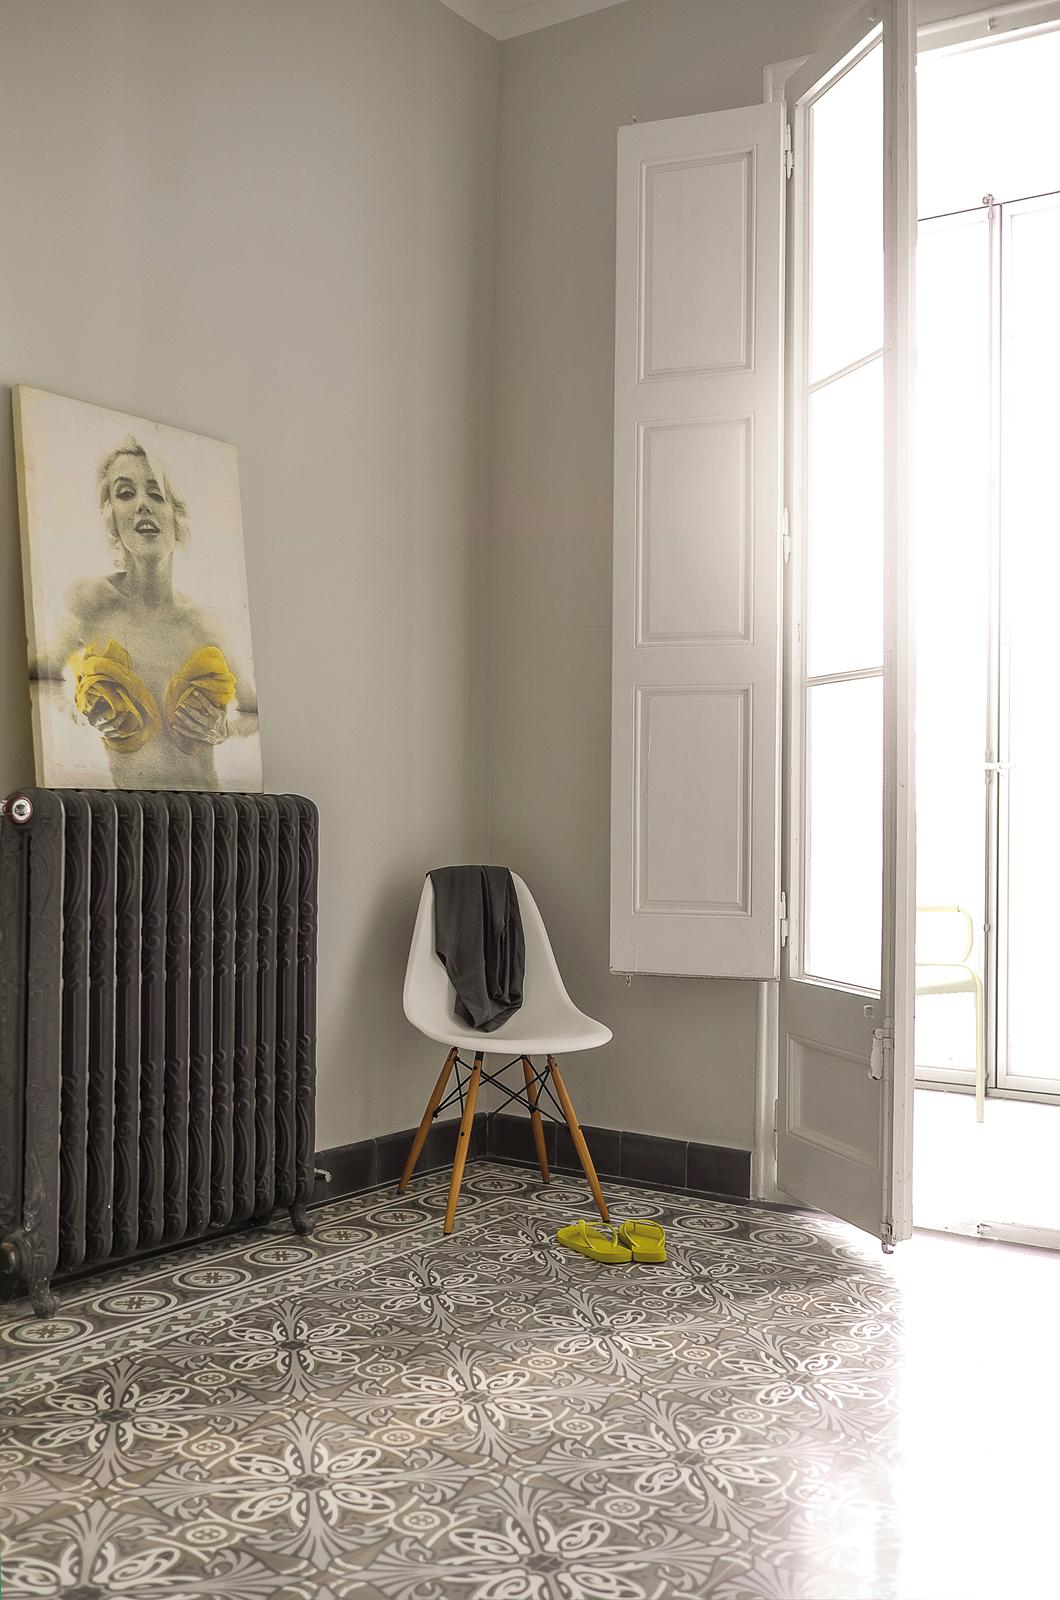 kreidefarbe-Leinen-110-schlafzimmer-zementfliesen-terrazzofliesen-viaplatten | Kreidefarbe Leinen 60 ml